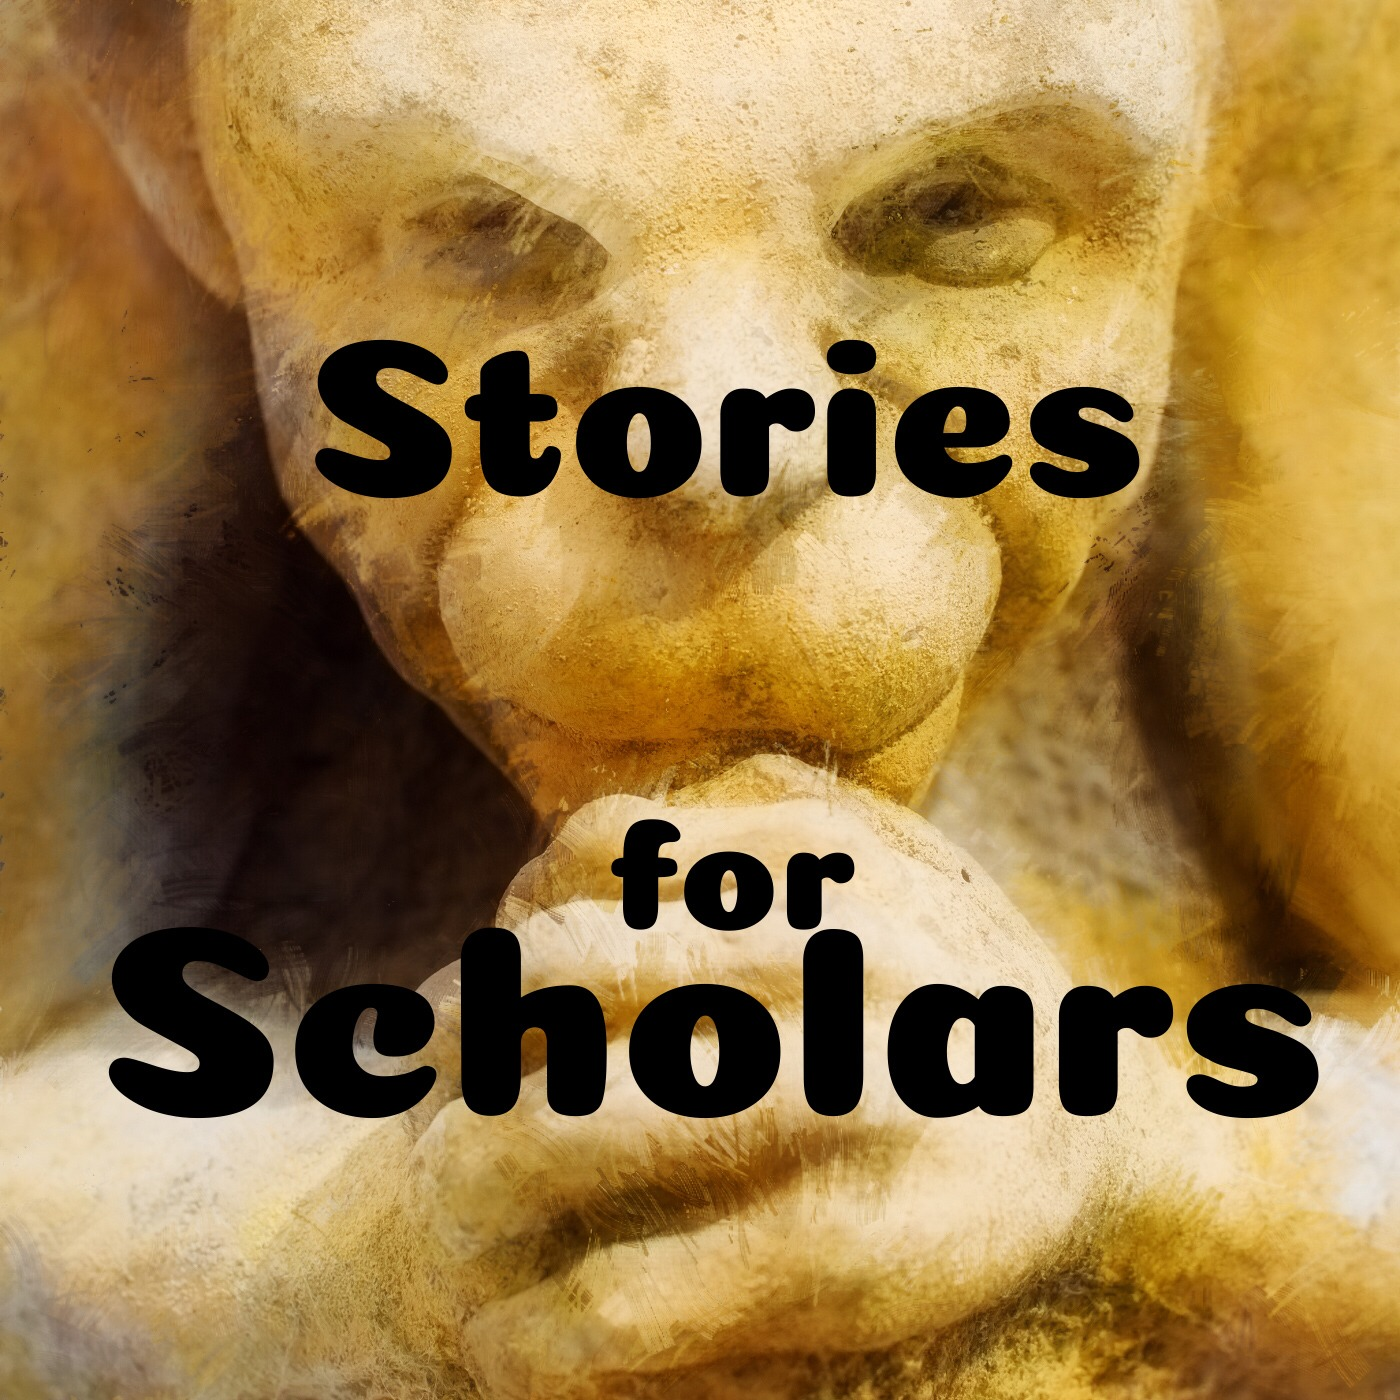 Stories for Scholars - White Hare, Vol. I